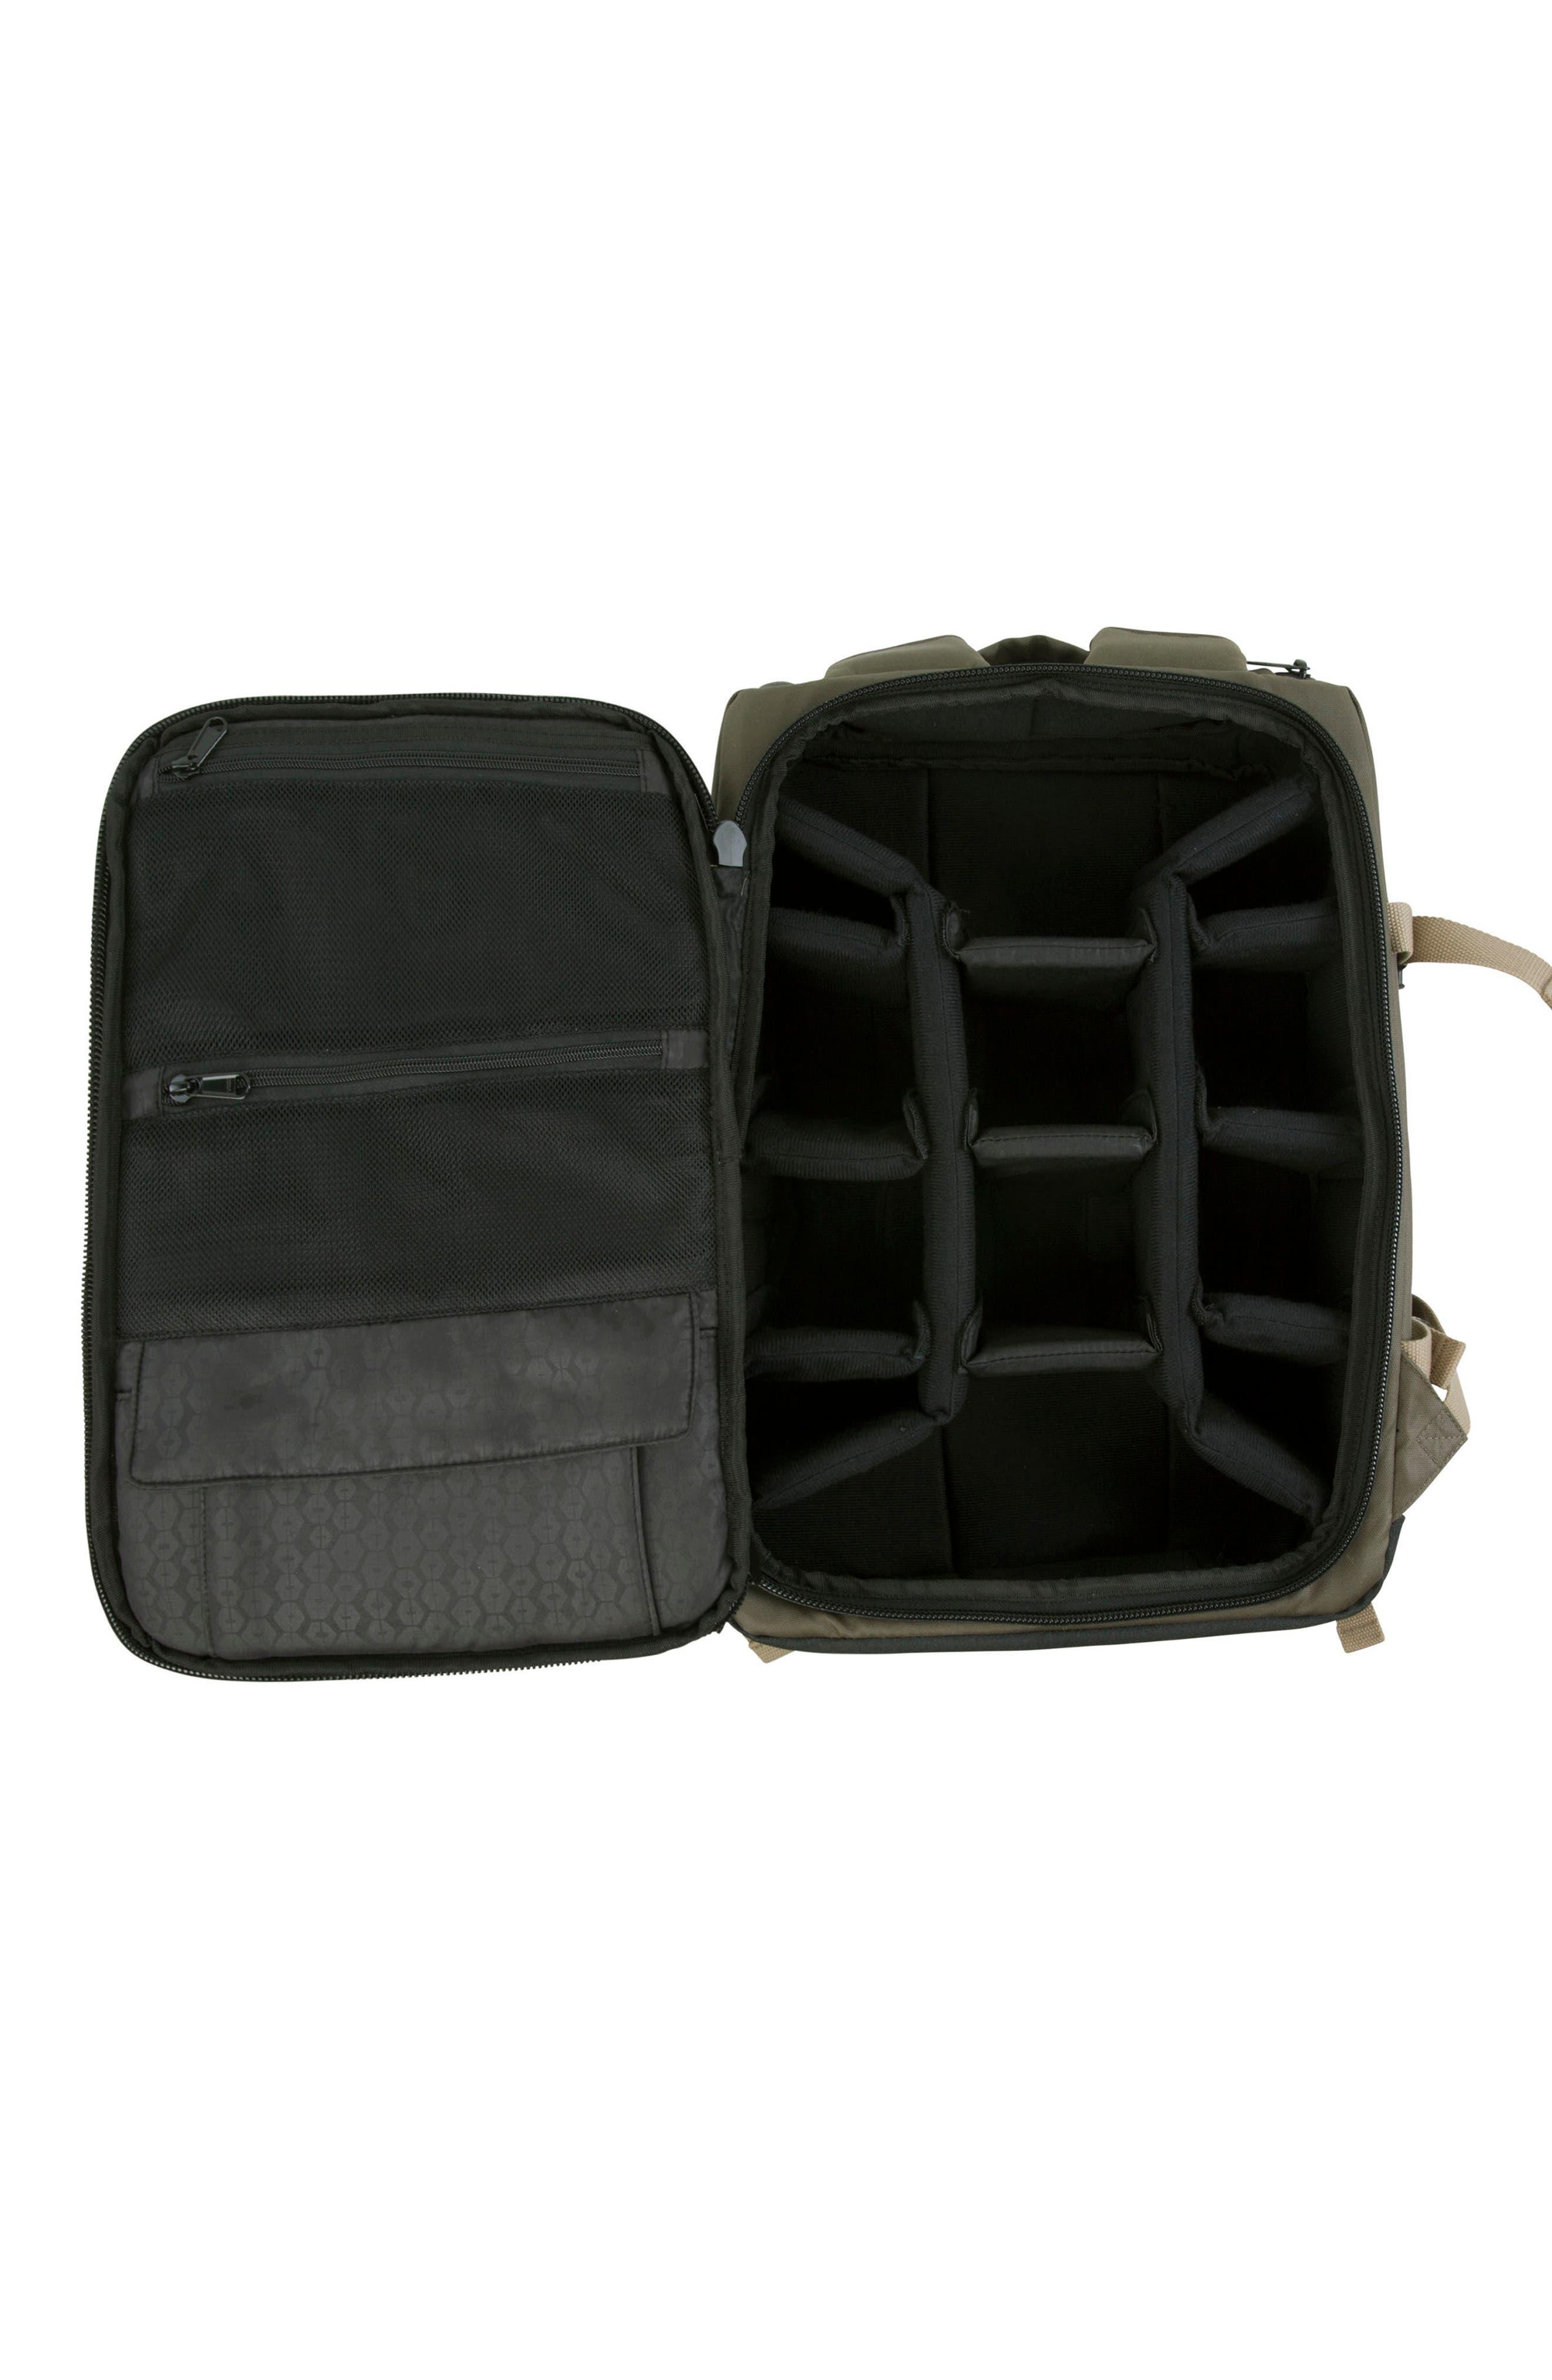 DSLR Camera Backpack,                             Alternate thumbnail 3, color,                             350